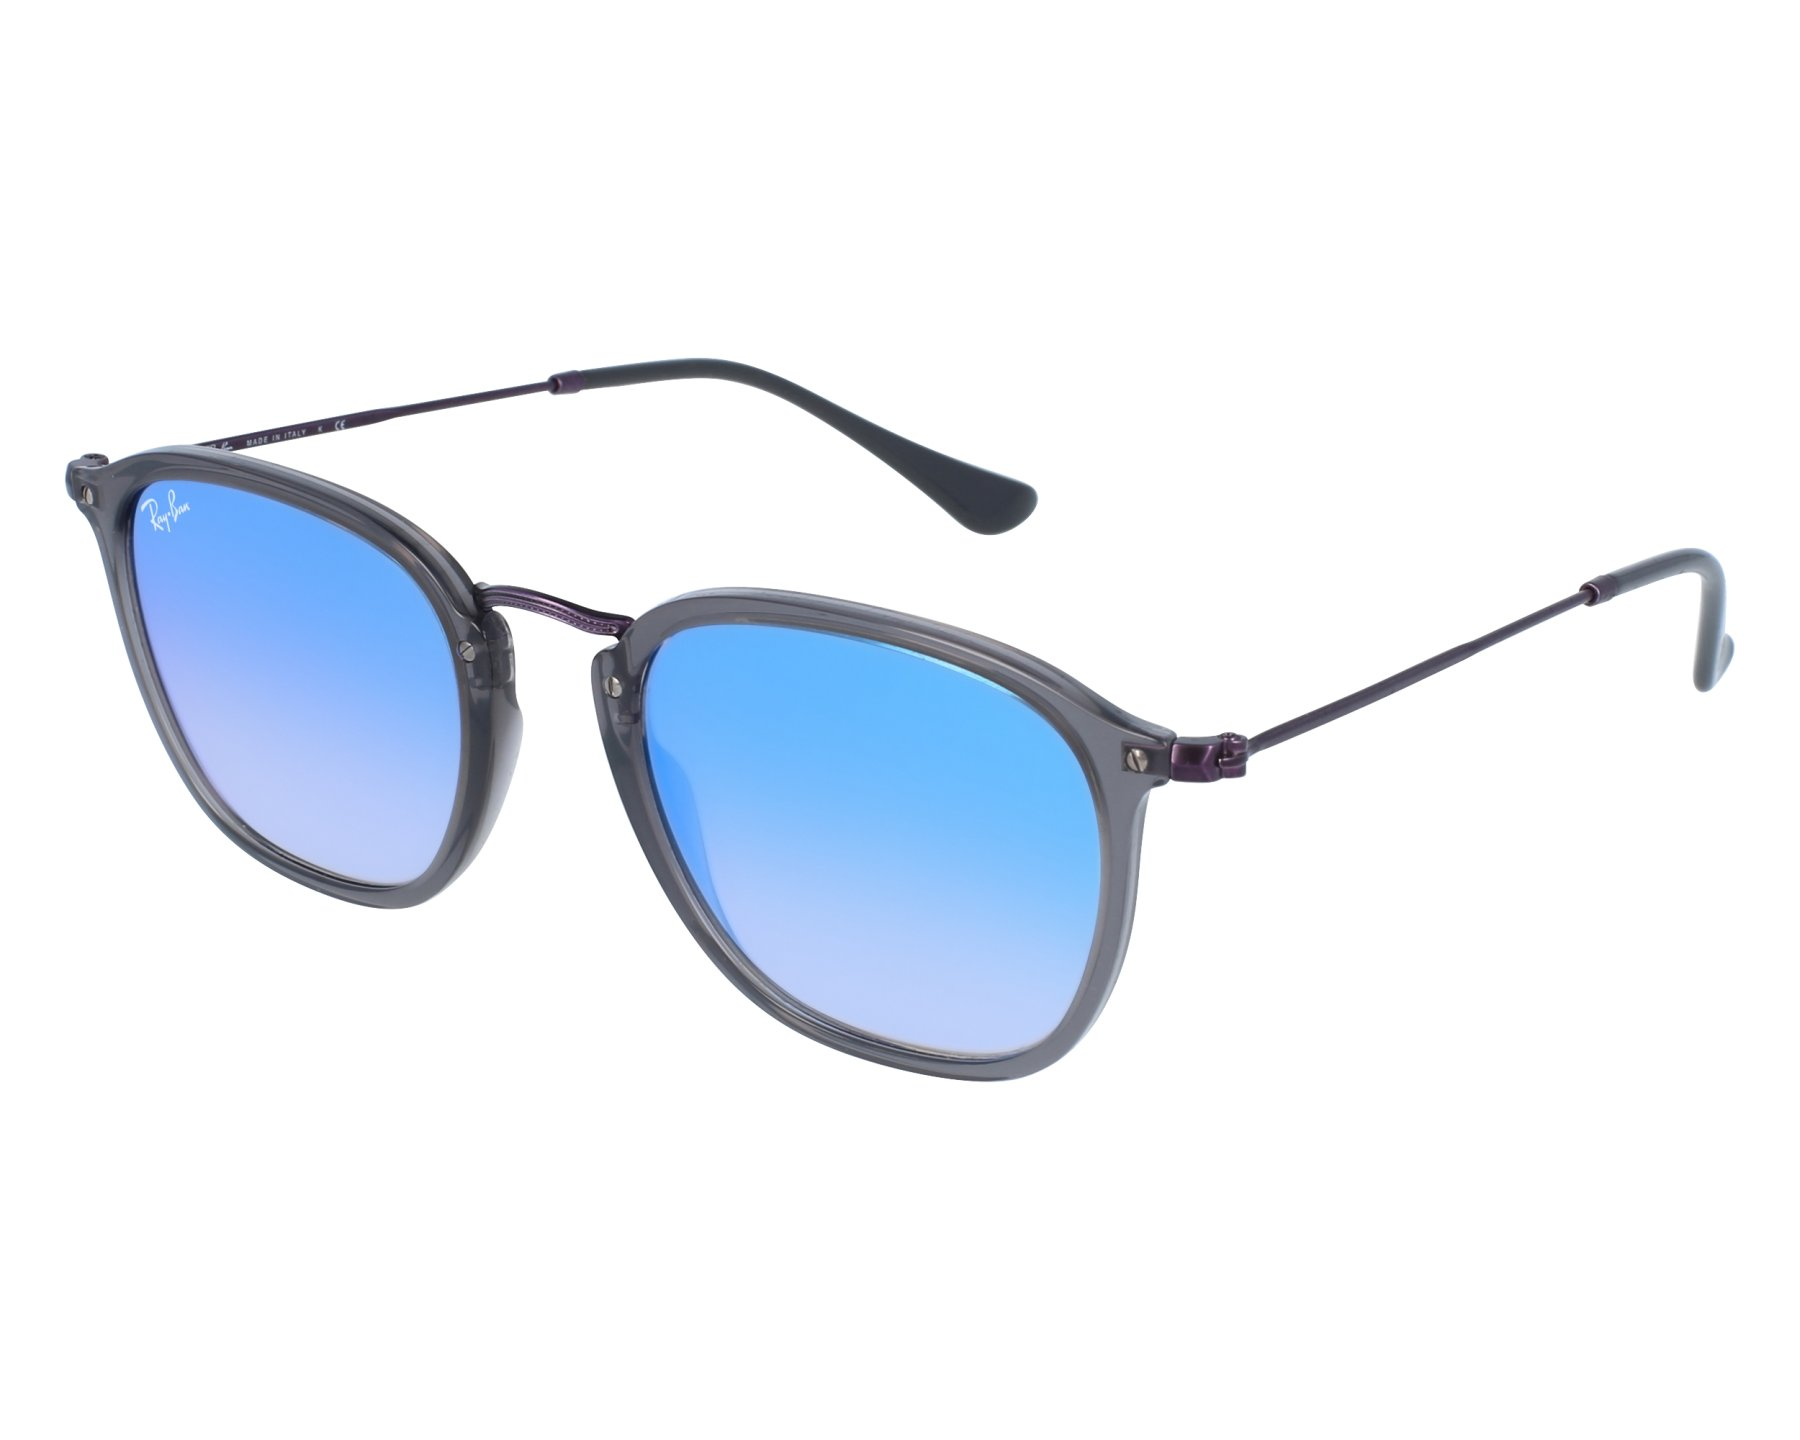 5361bbaa79 Sunglasses Ray-Ban RB-2448-N 6255 4O 51-21 Grey